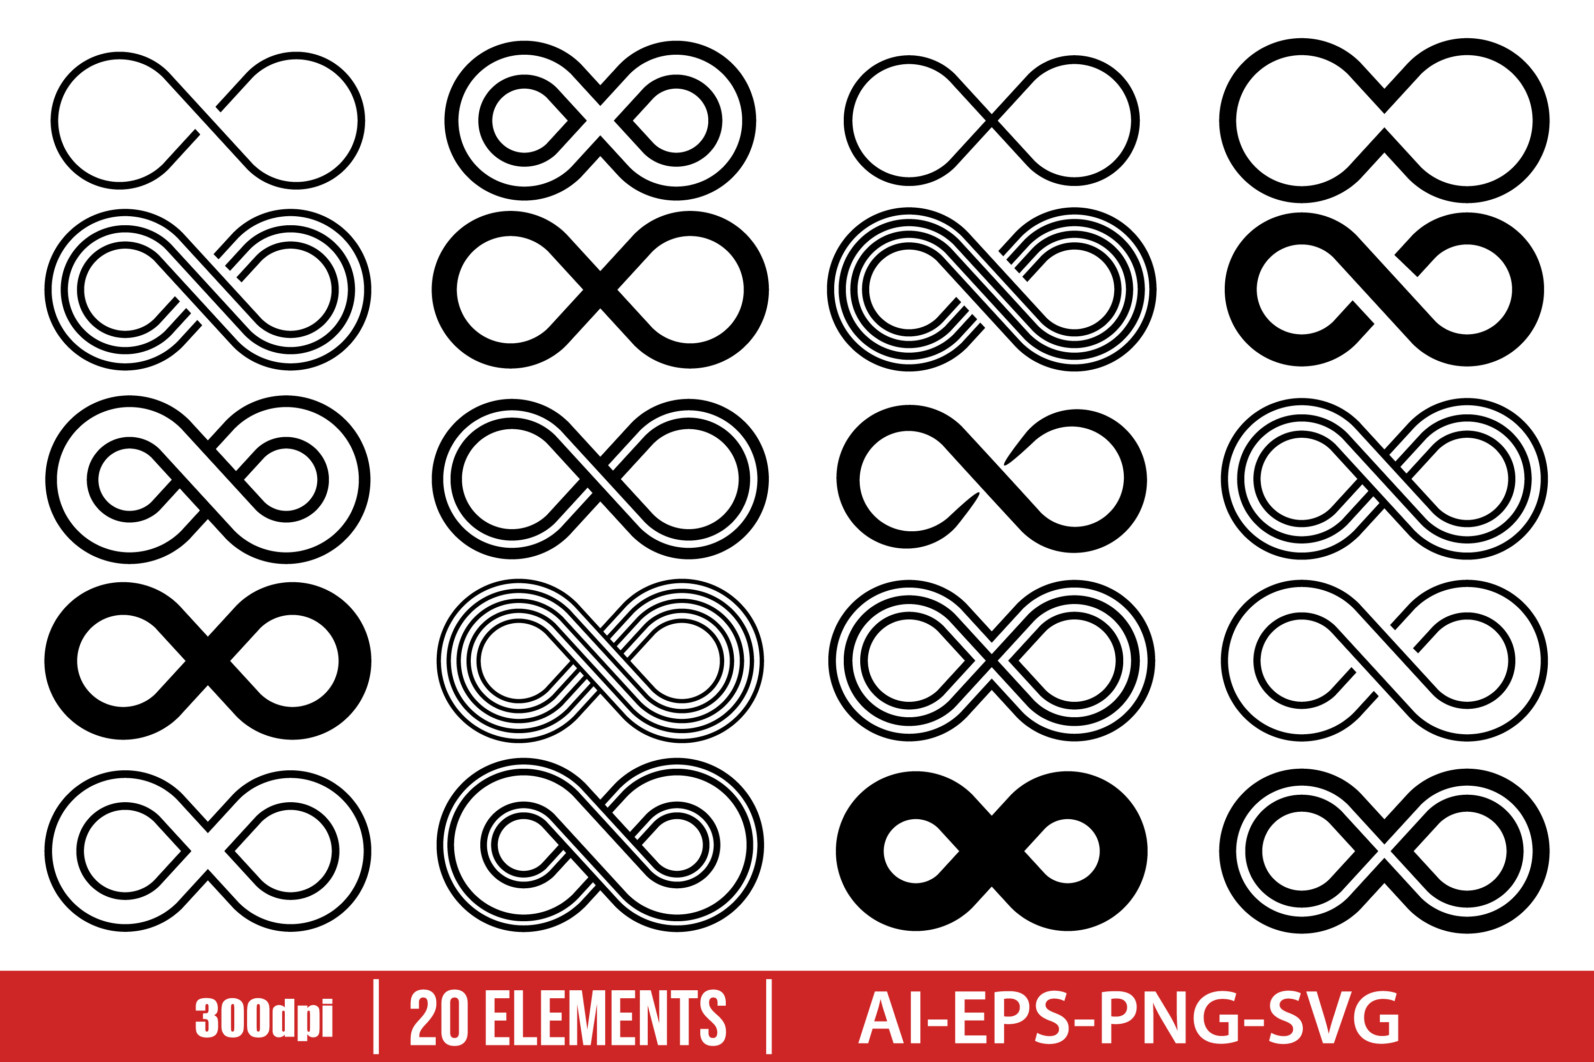 Infinity icon clipart vector design illustration. Infinity set. Vector Clipart Print - INFINITY scaled -